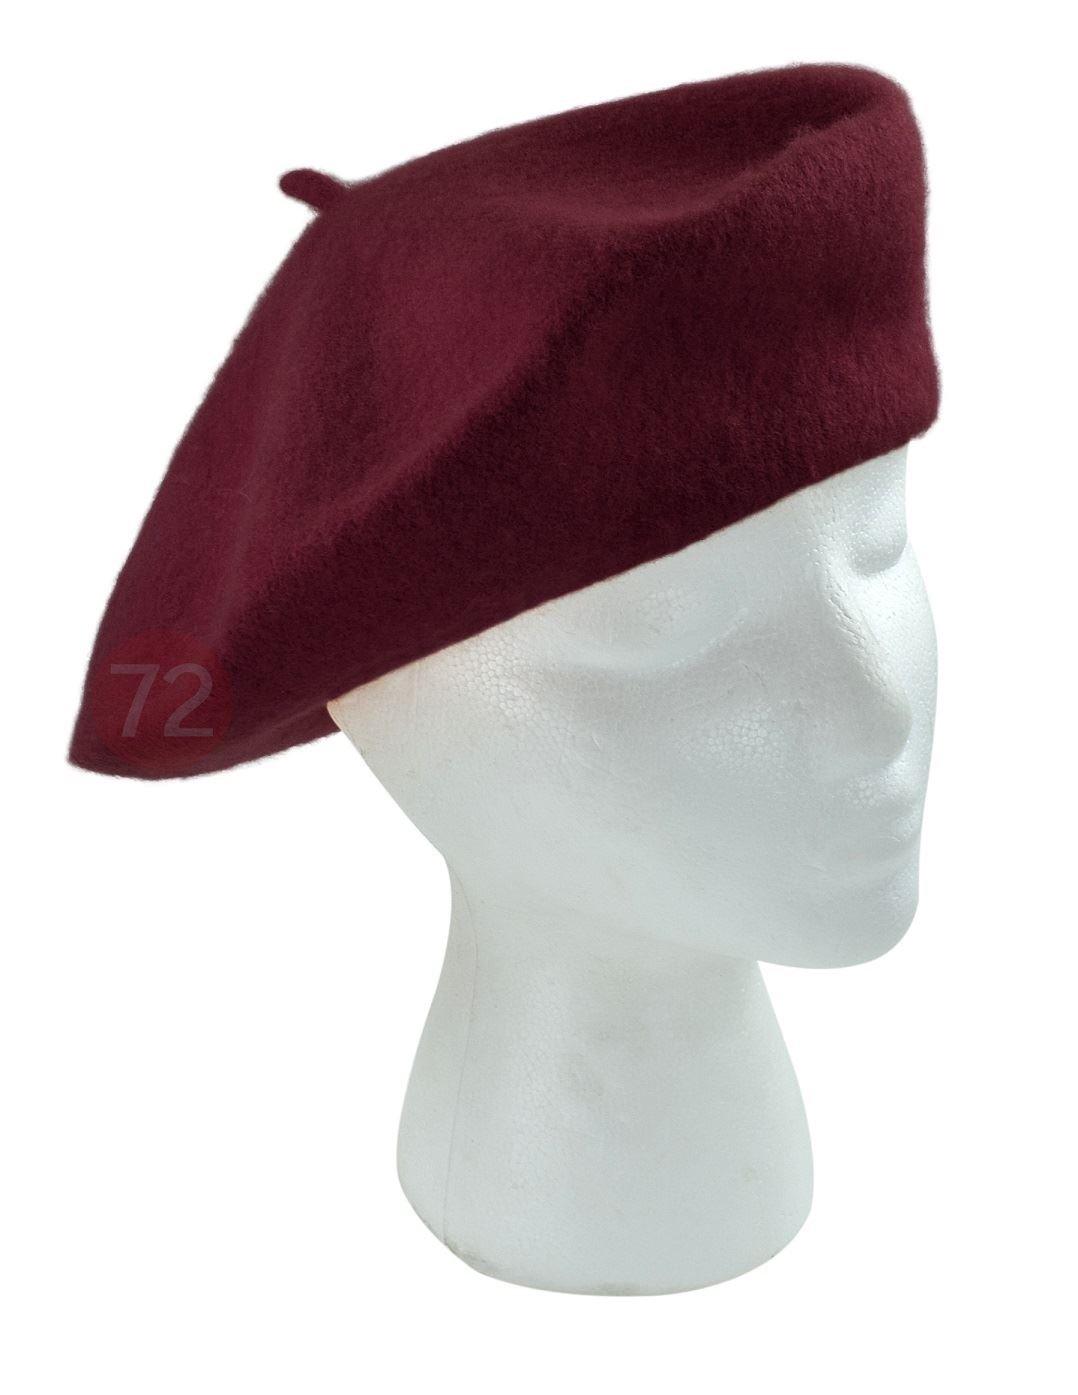 True Wool Beret Burgundy For Women Seleny WH4010-BURGANDY